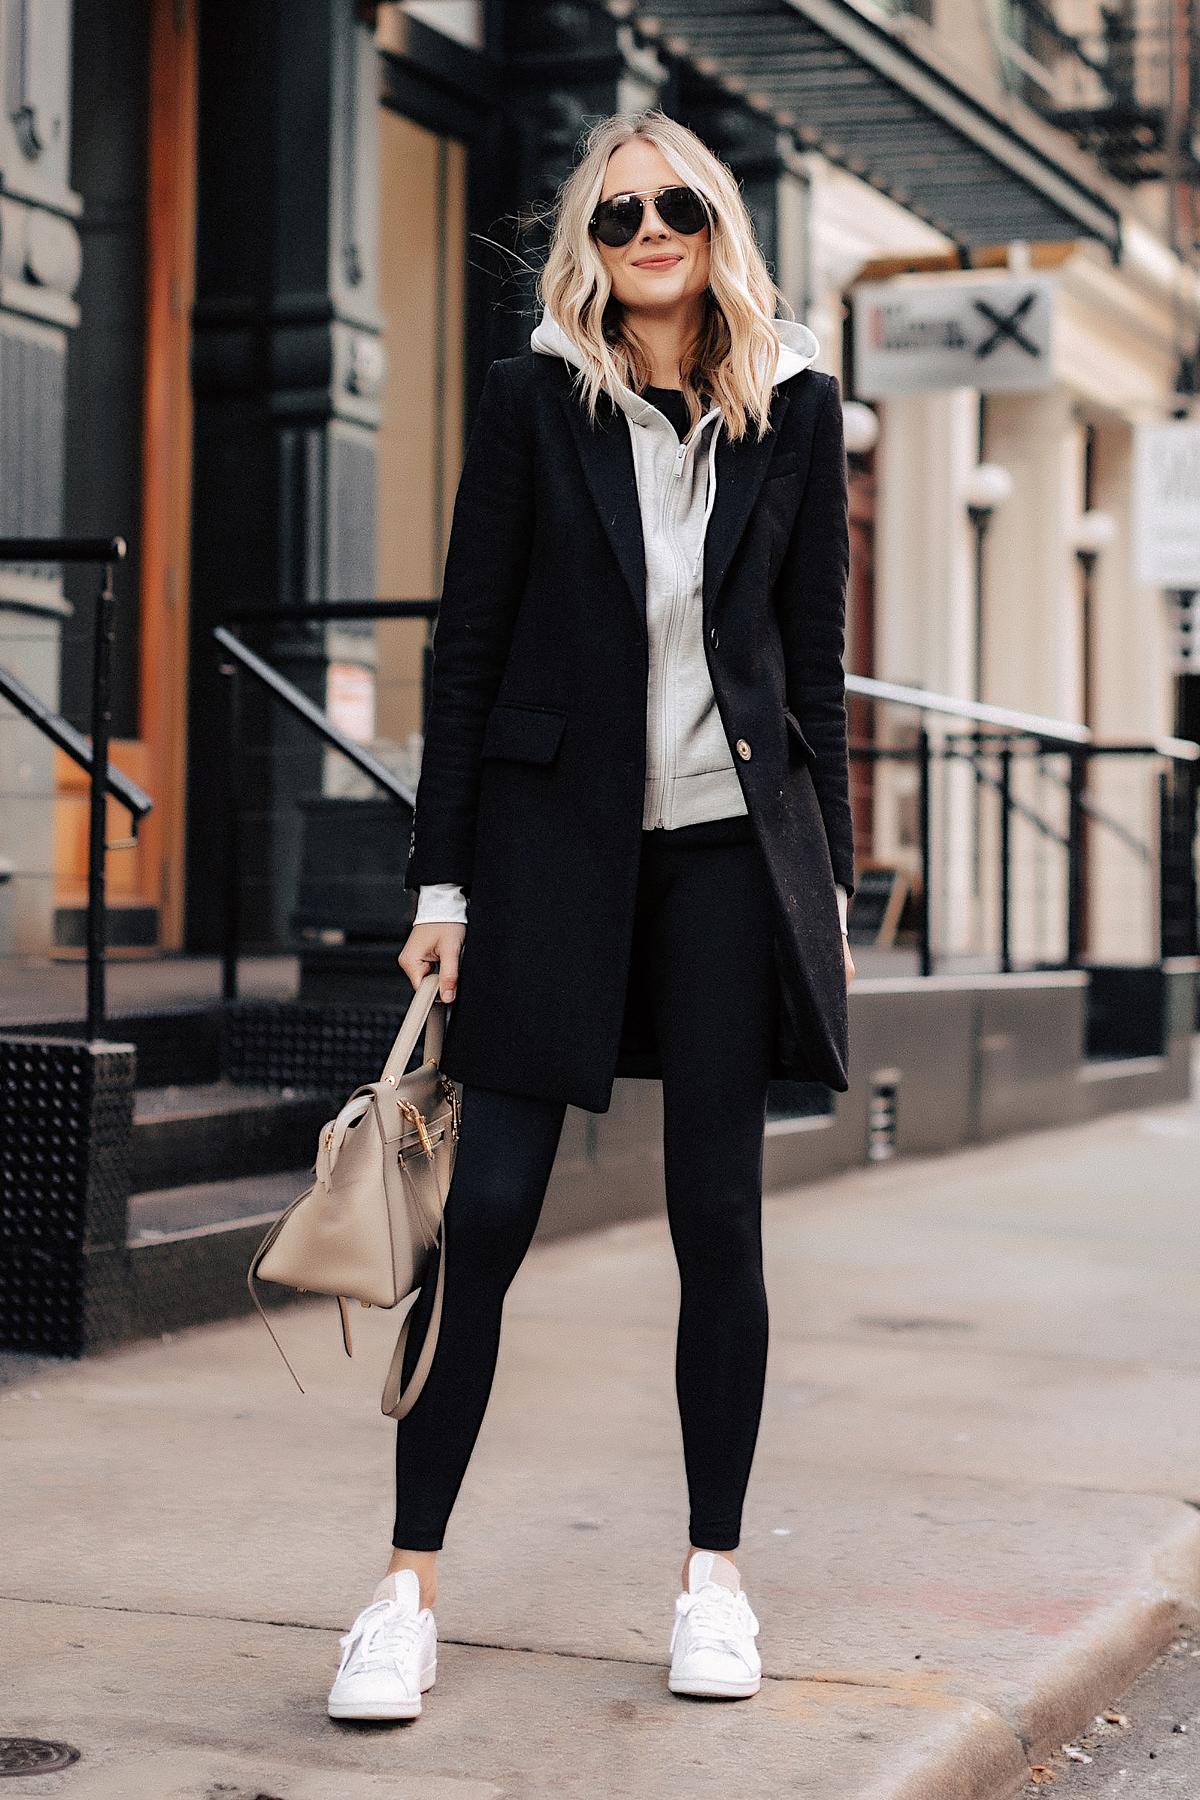 Fashion Jackson Wearing Black Wool Coat Grey Hoodie Black Leggings adidas white Stan Smith Sneakers New York Street Style